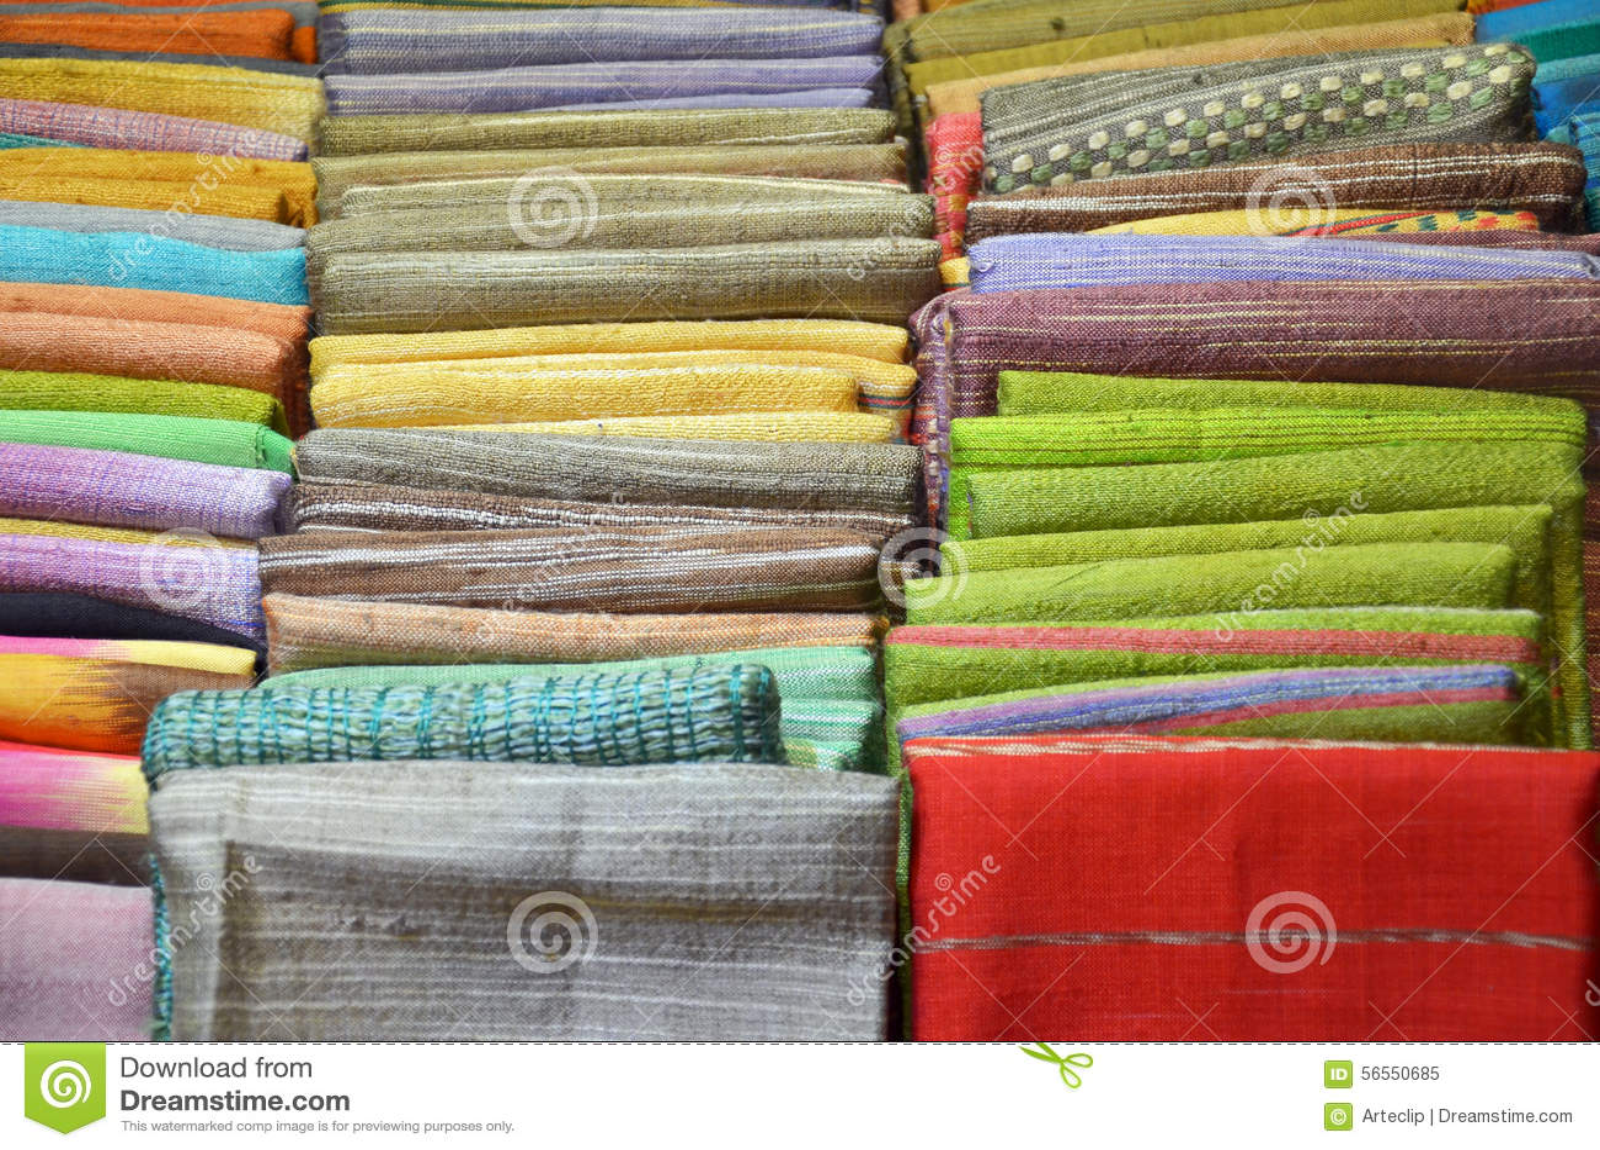 Download Σωρός του παραδοσιακού κλωστοϋφαντουργικού προϊόντος στην αγορά της Ταϊλάνδης Στοκ Εικόνα - εικόνα από largest, ξέν: 56550685